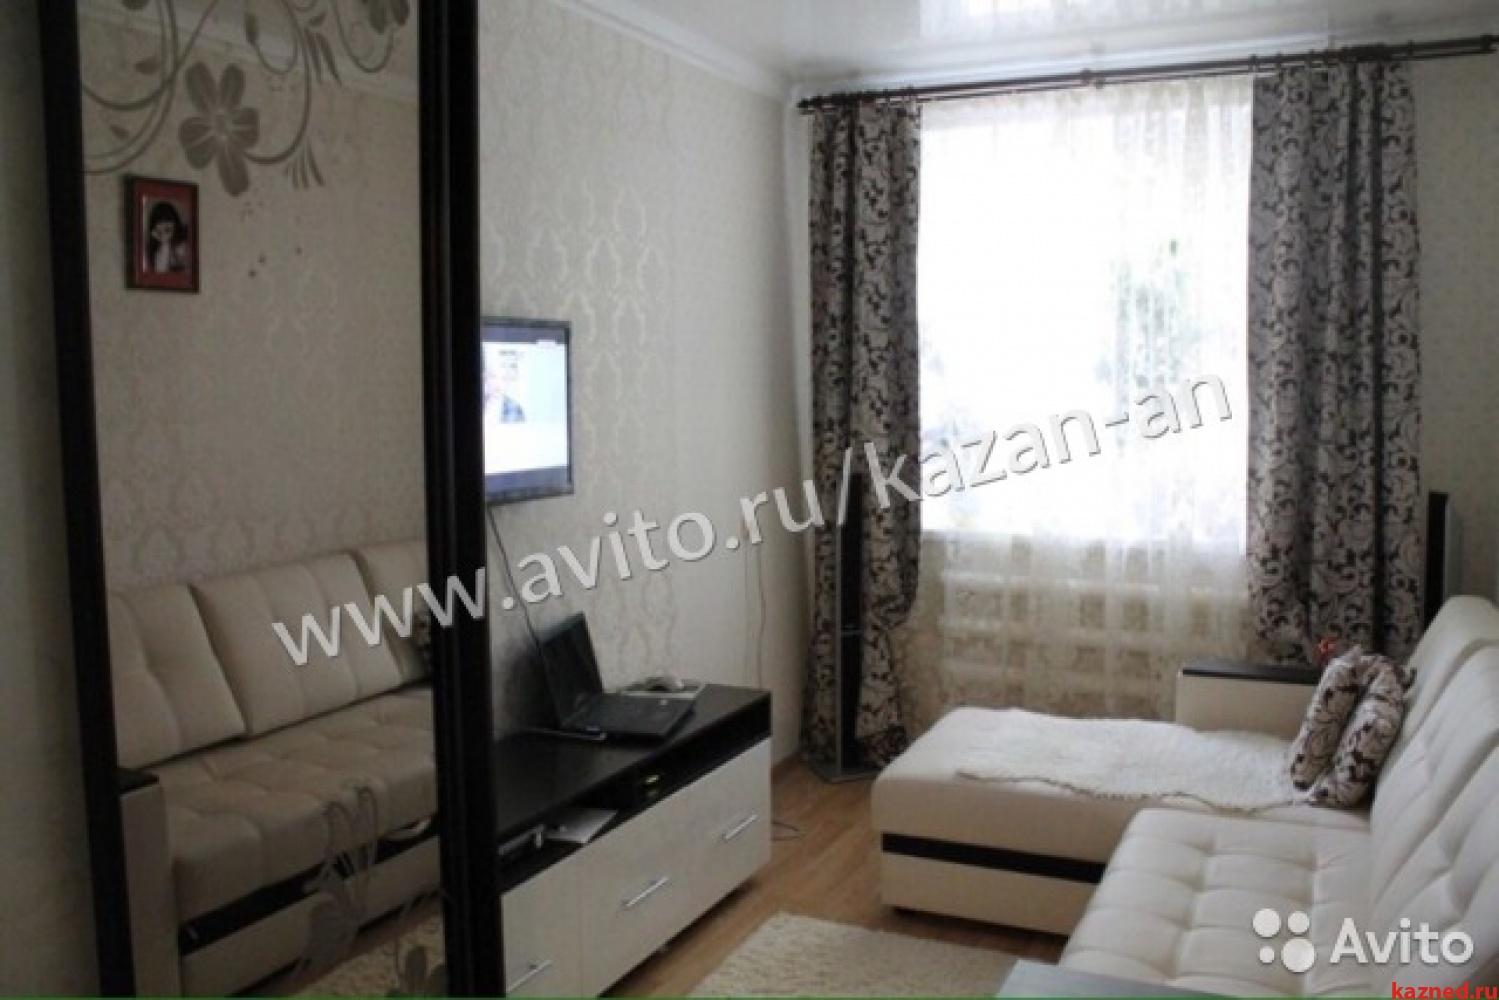 Продажа 2-к квартиры Солидарности (Дербышки) ул, 32, 50 м² (миниатюра №6)